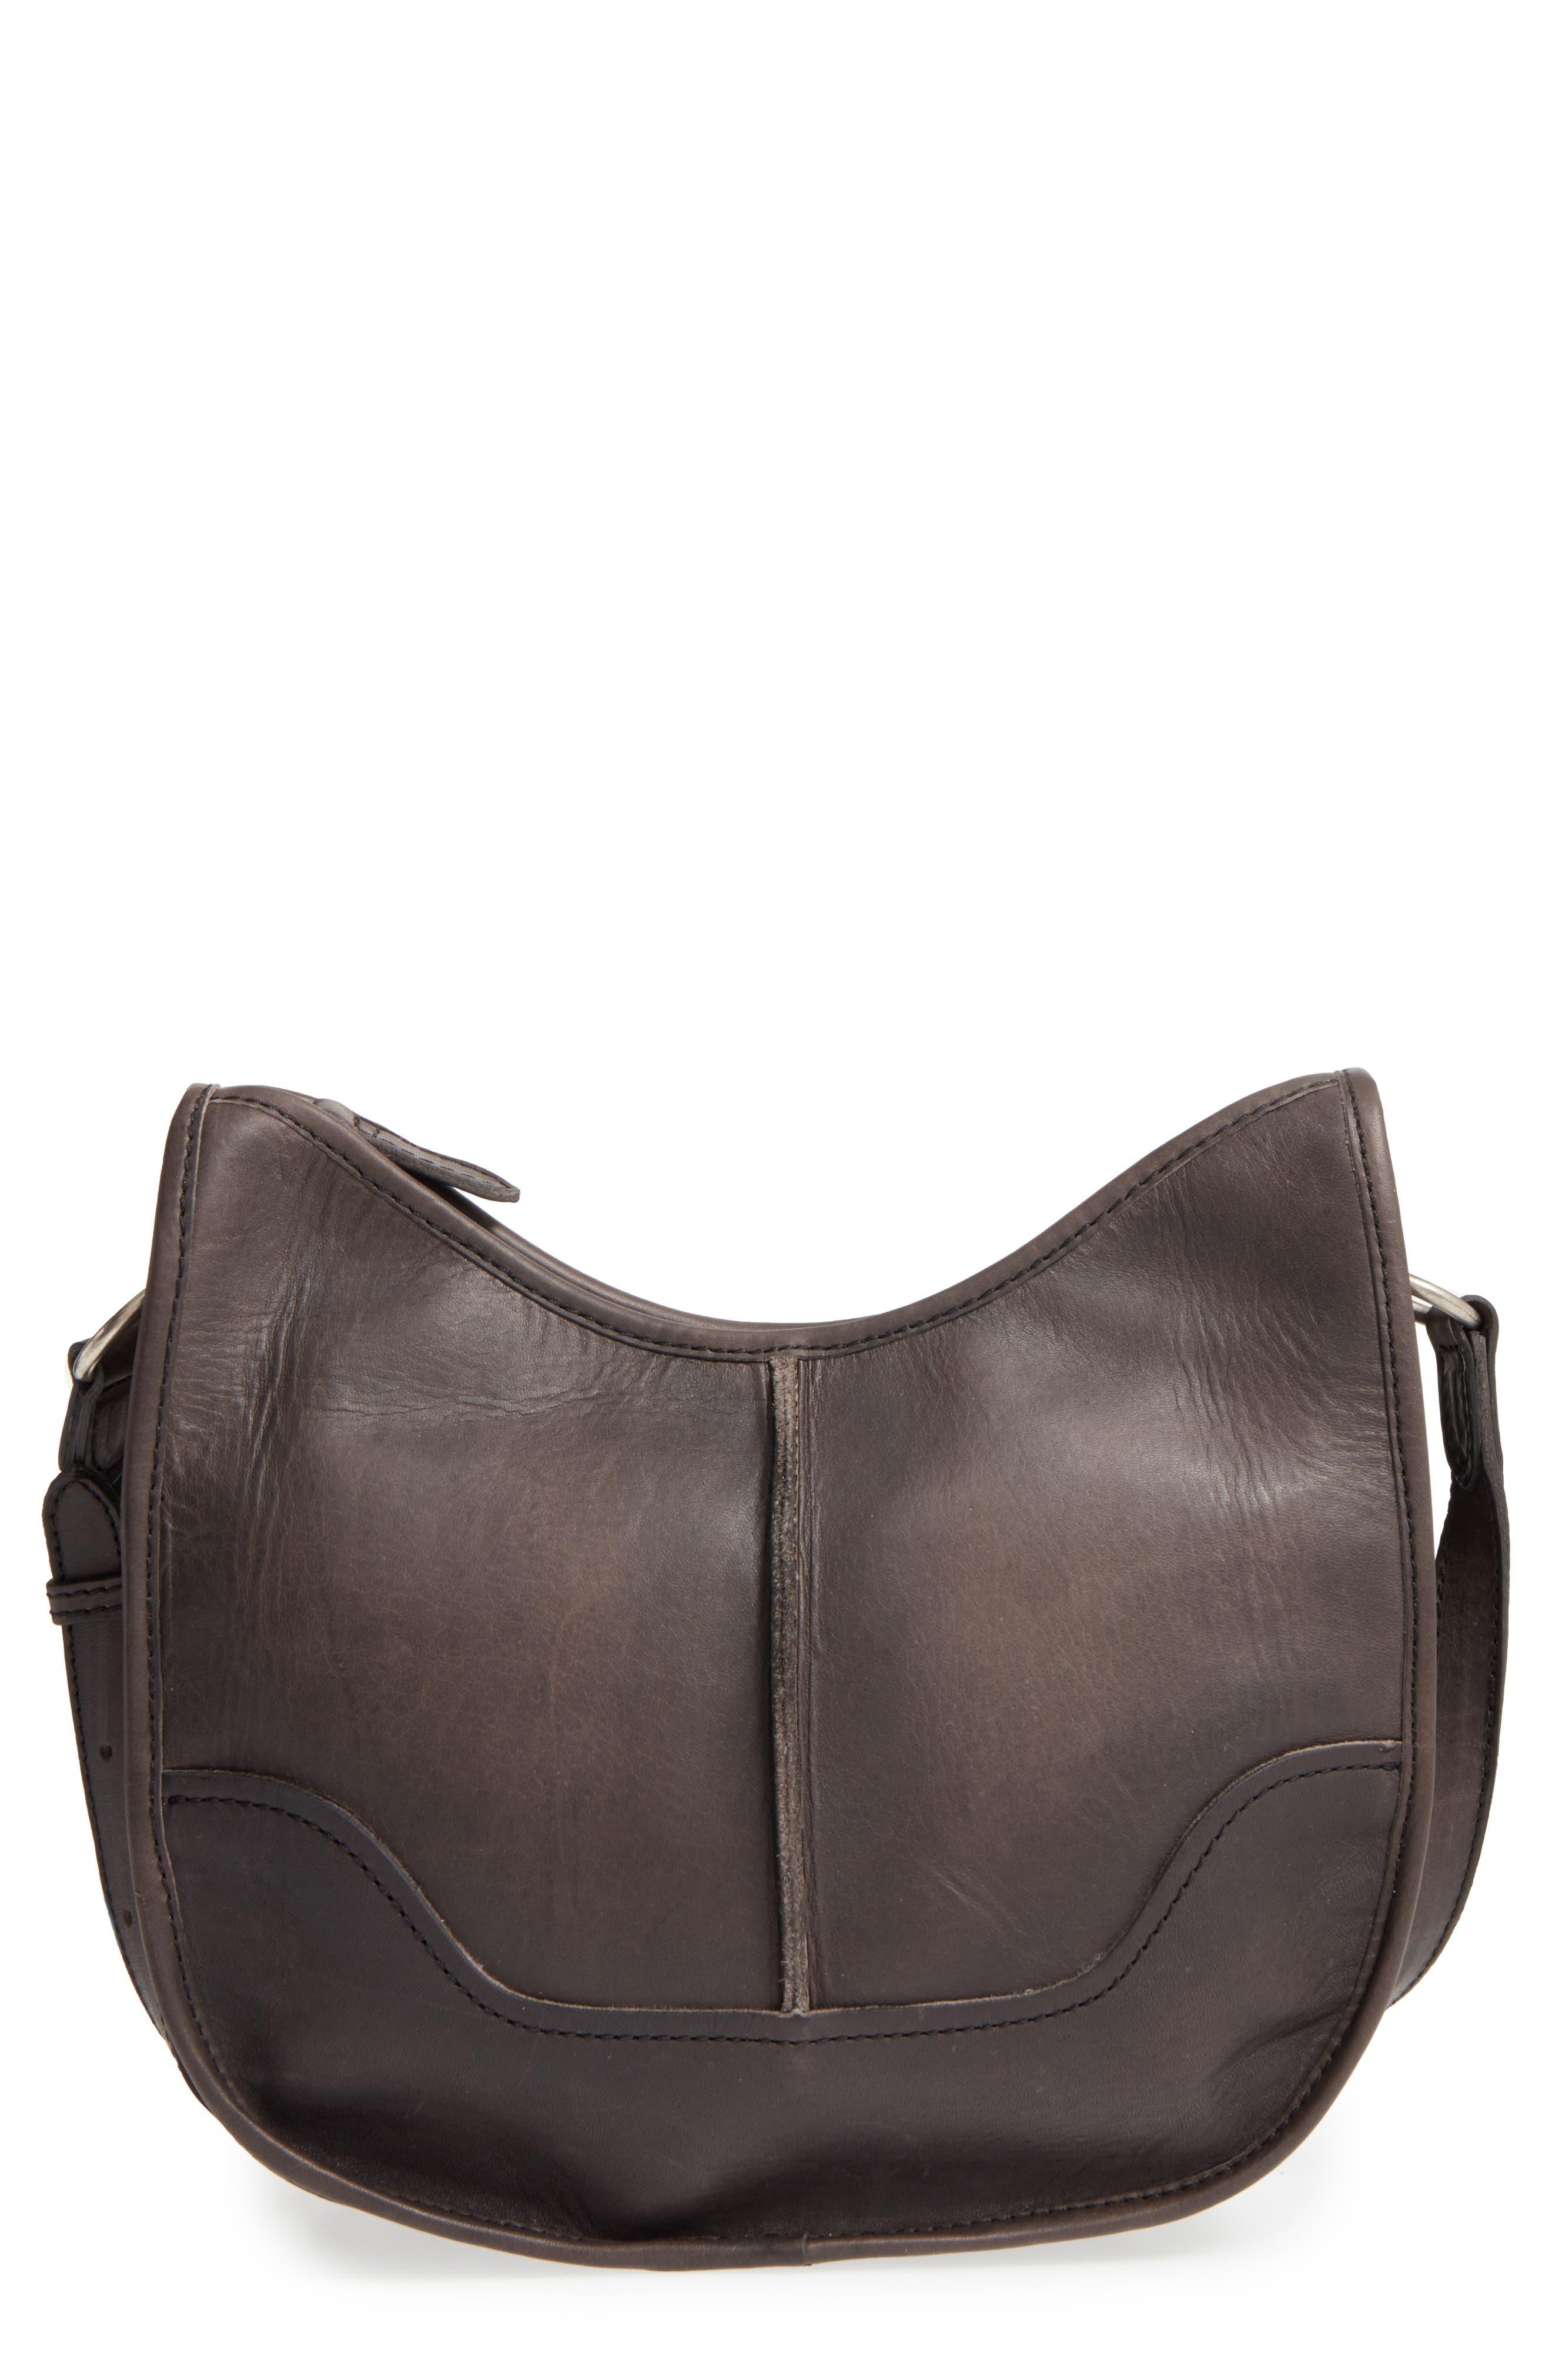 Cara Leather Saddle Bag,                             Main thumbnail 1, color,                             020